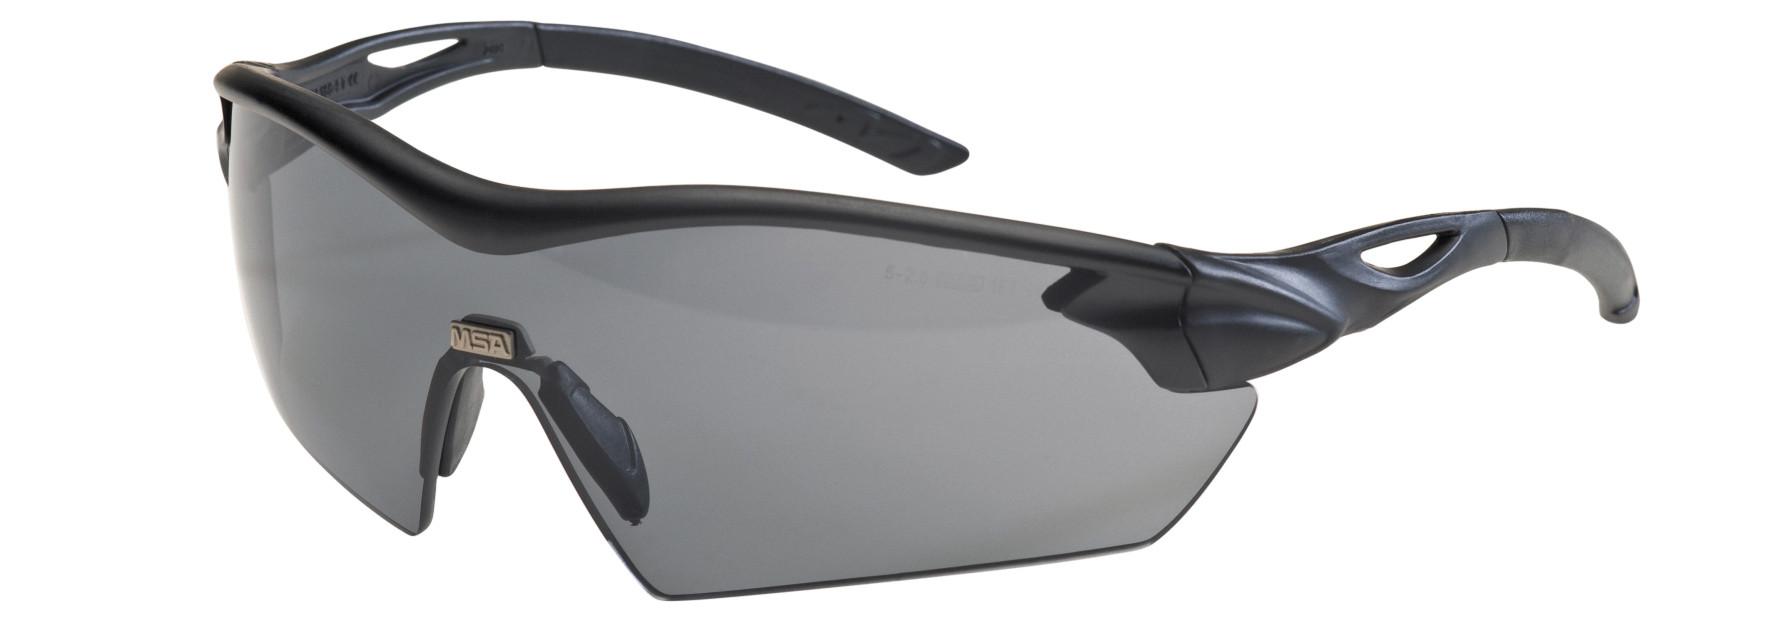 12ST MSA Veiligheidsbril Racers smoke (Donker)